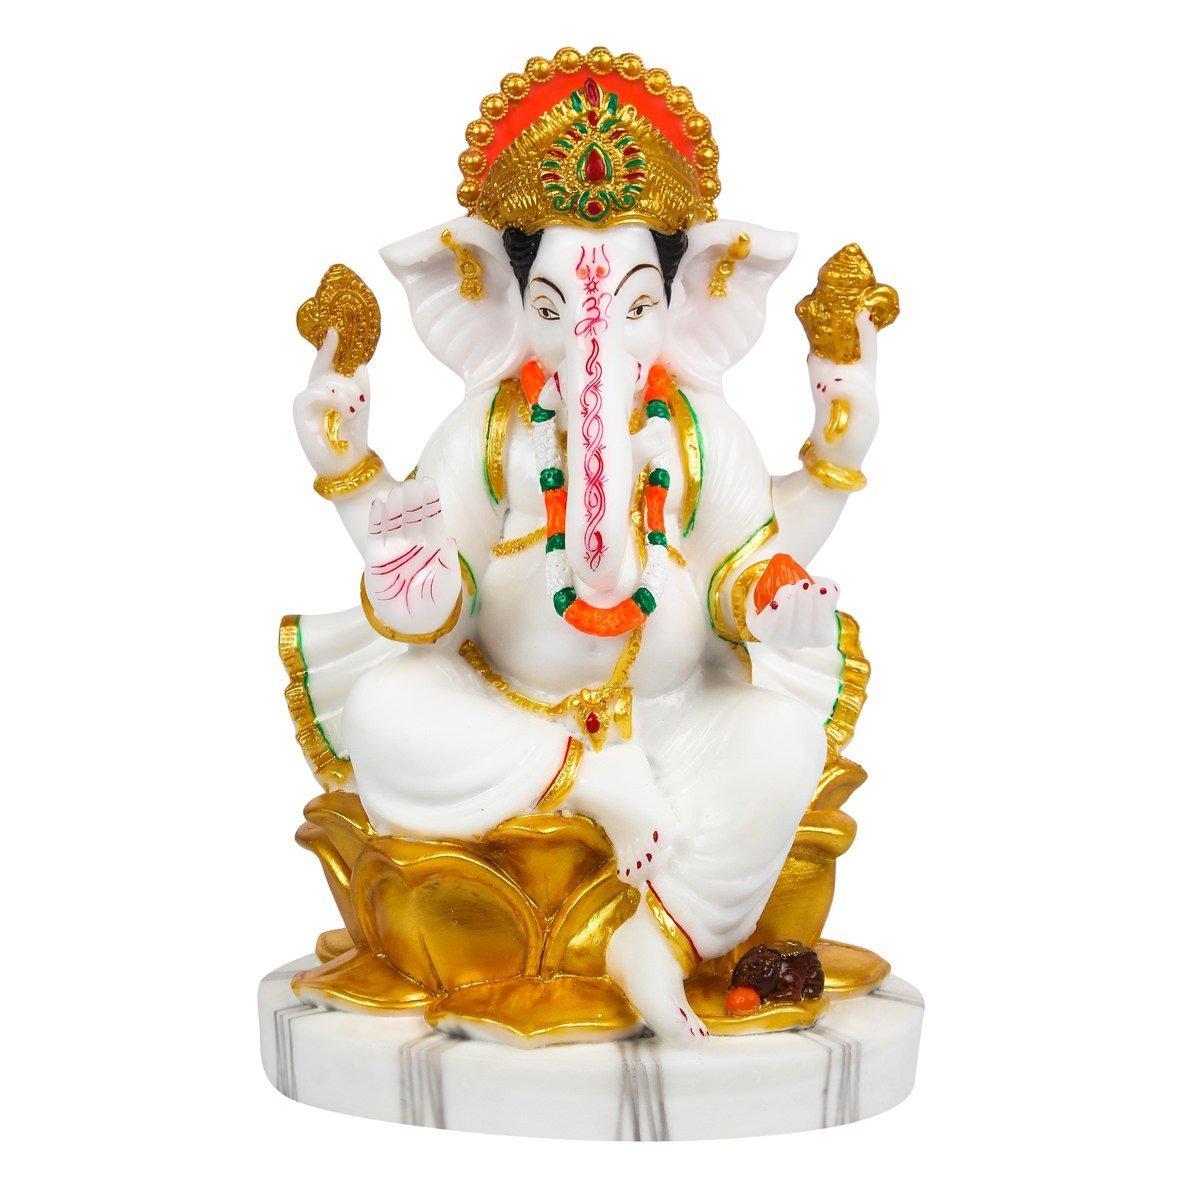 Falzone Marble Lord Ganesha Idol God Ganpati/Ganesh Handicraft Statue